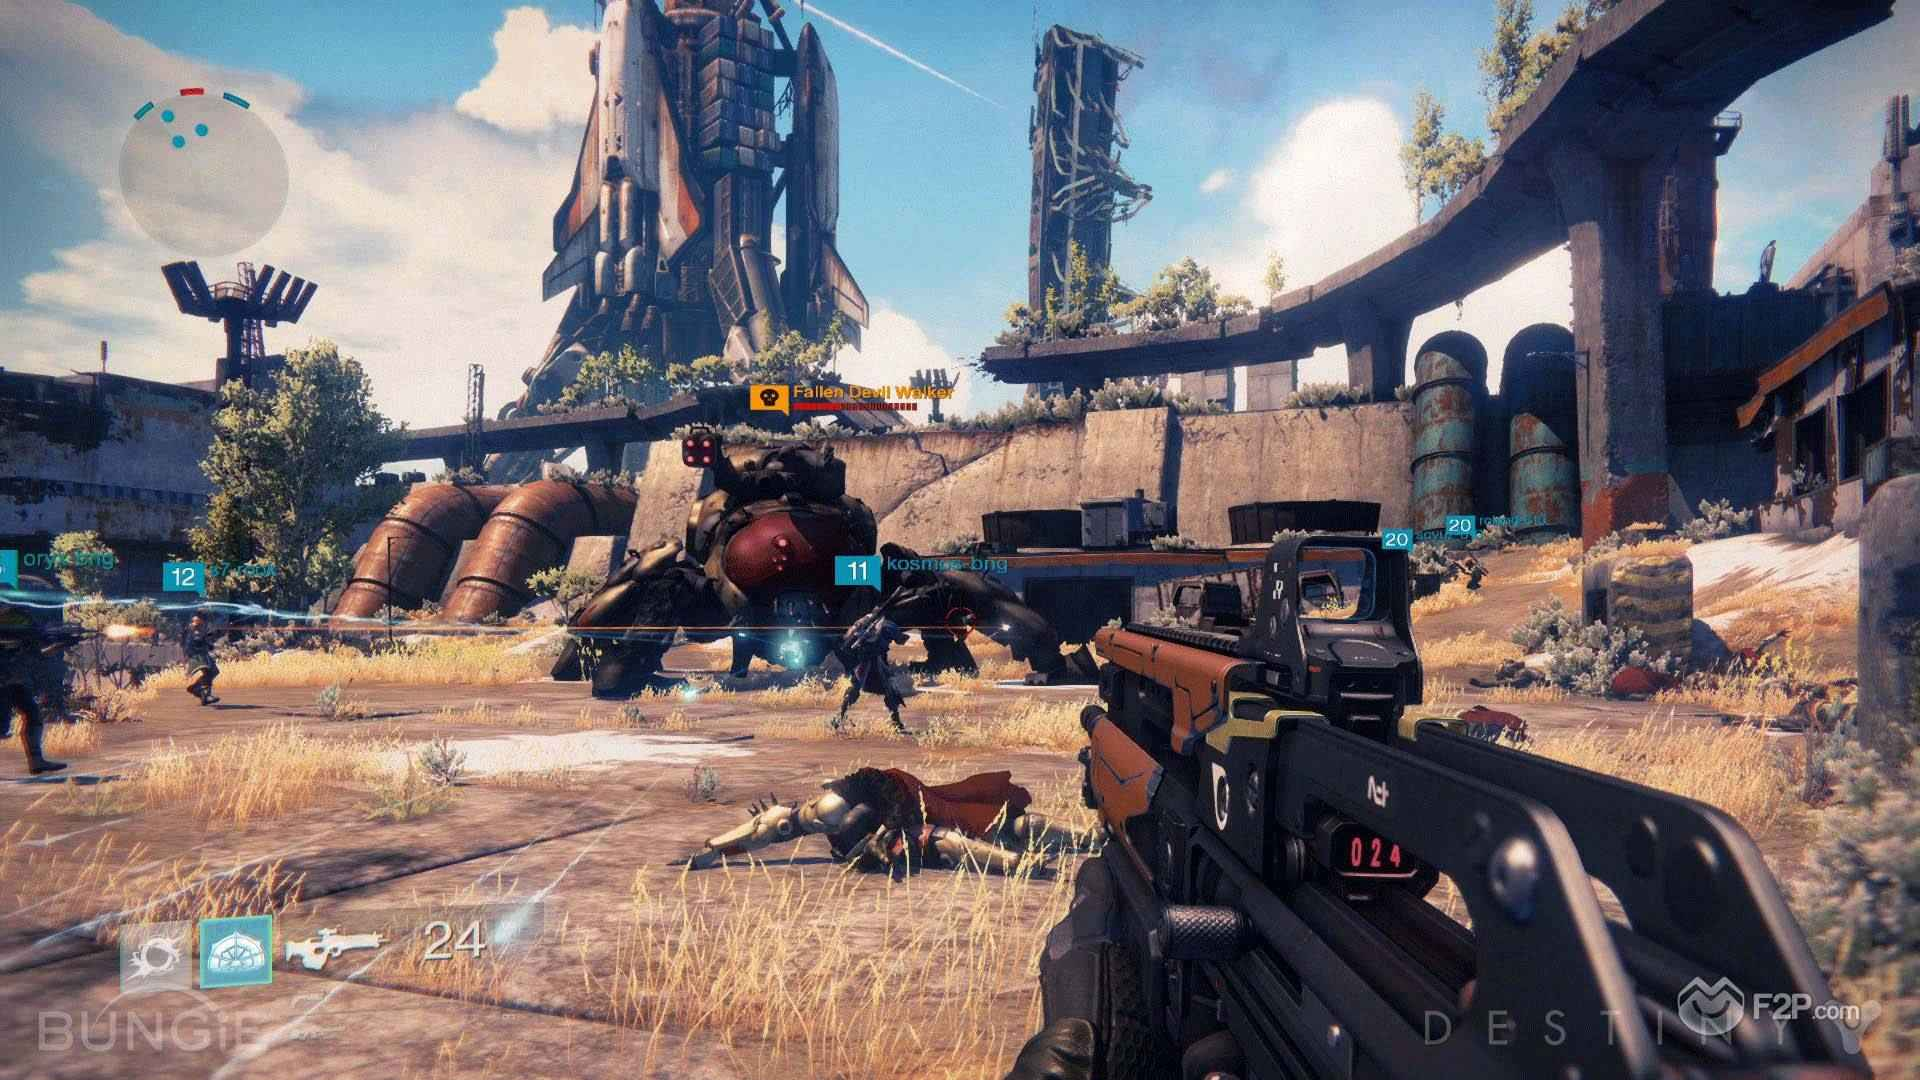 Destiny-screenshots-9.jpg